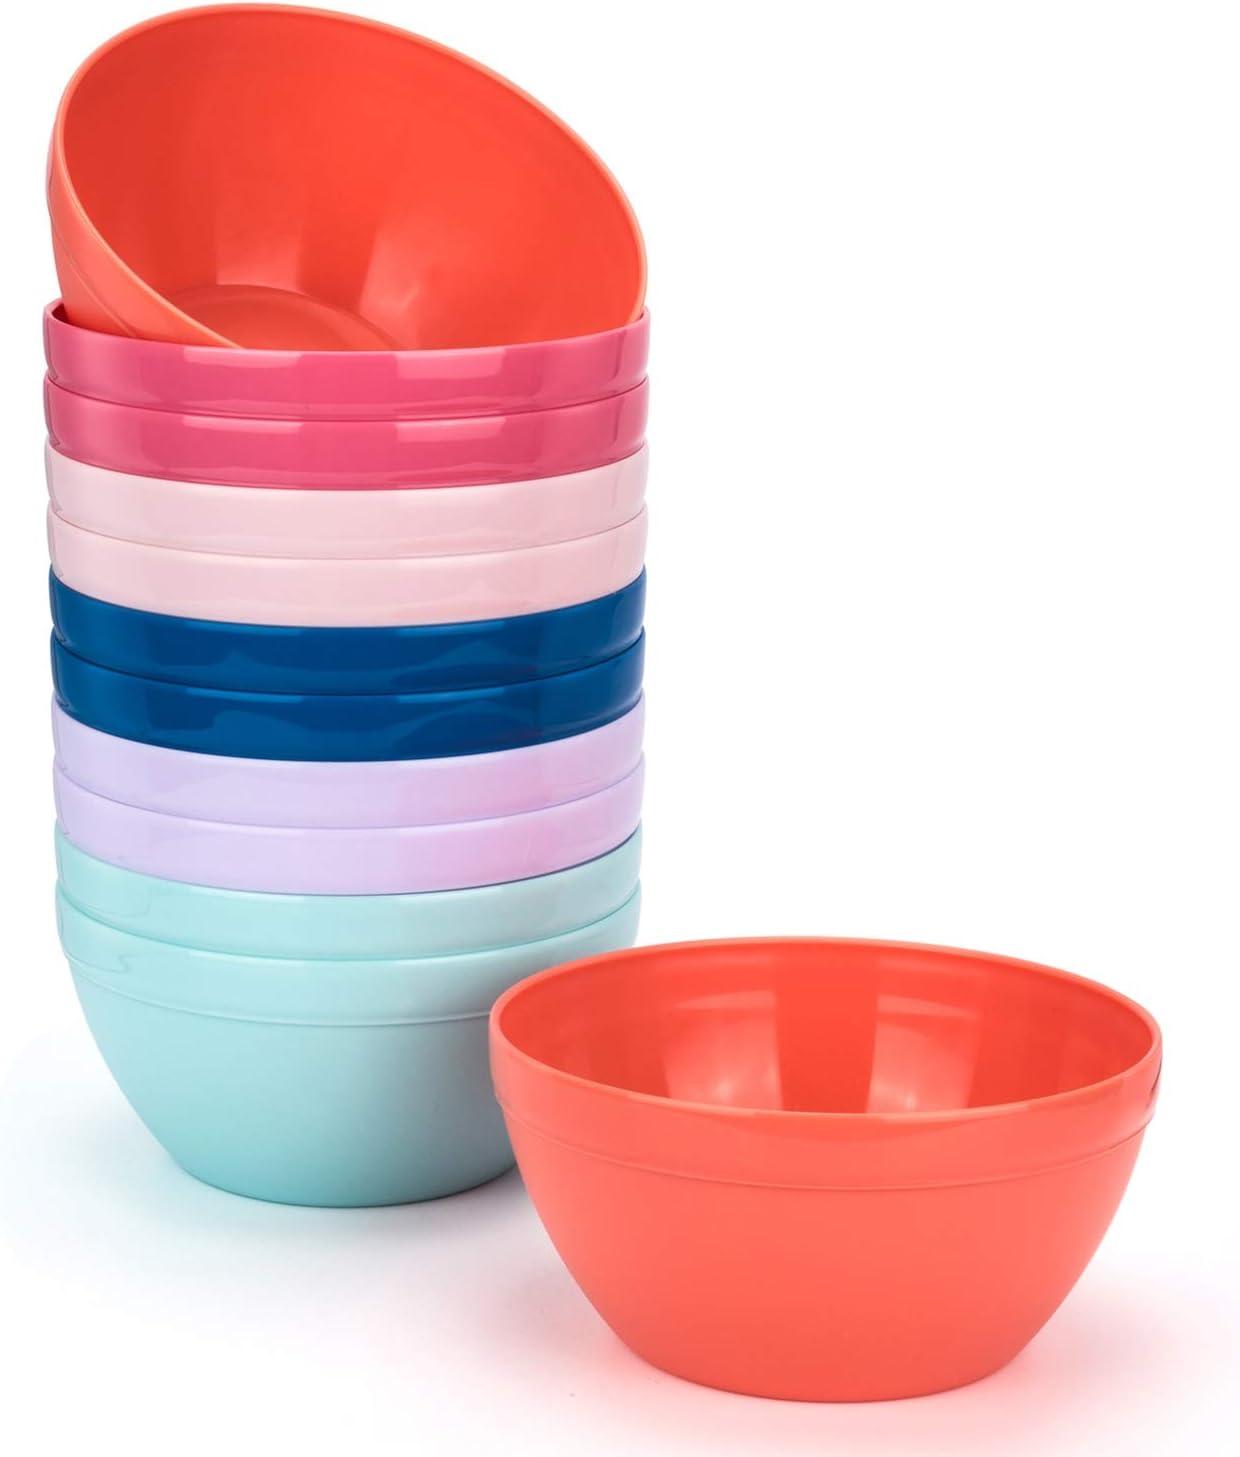 Unbreakable 30-ounce Plastic Bowls Salad Bowls Cereal Bowls - Dishwasher safe, BPA Free (12, Multicolor)